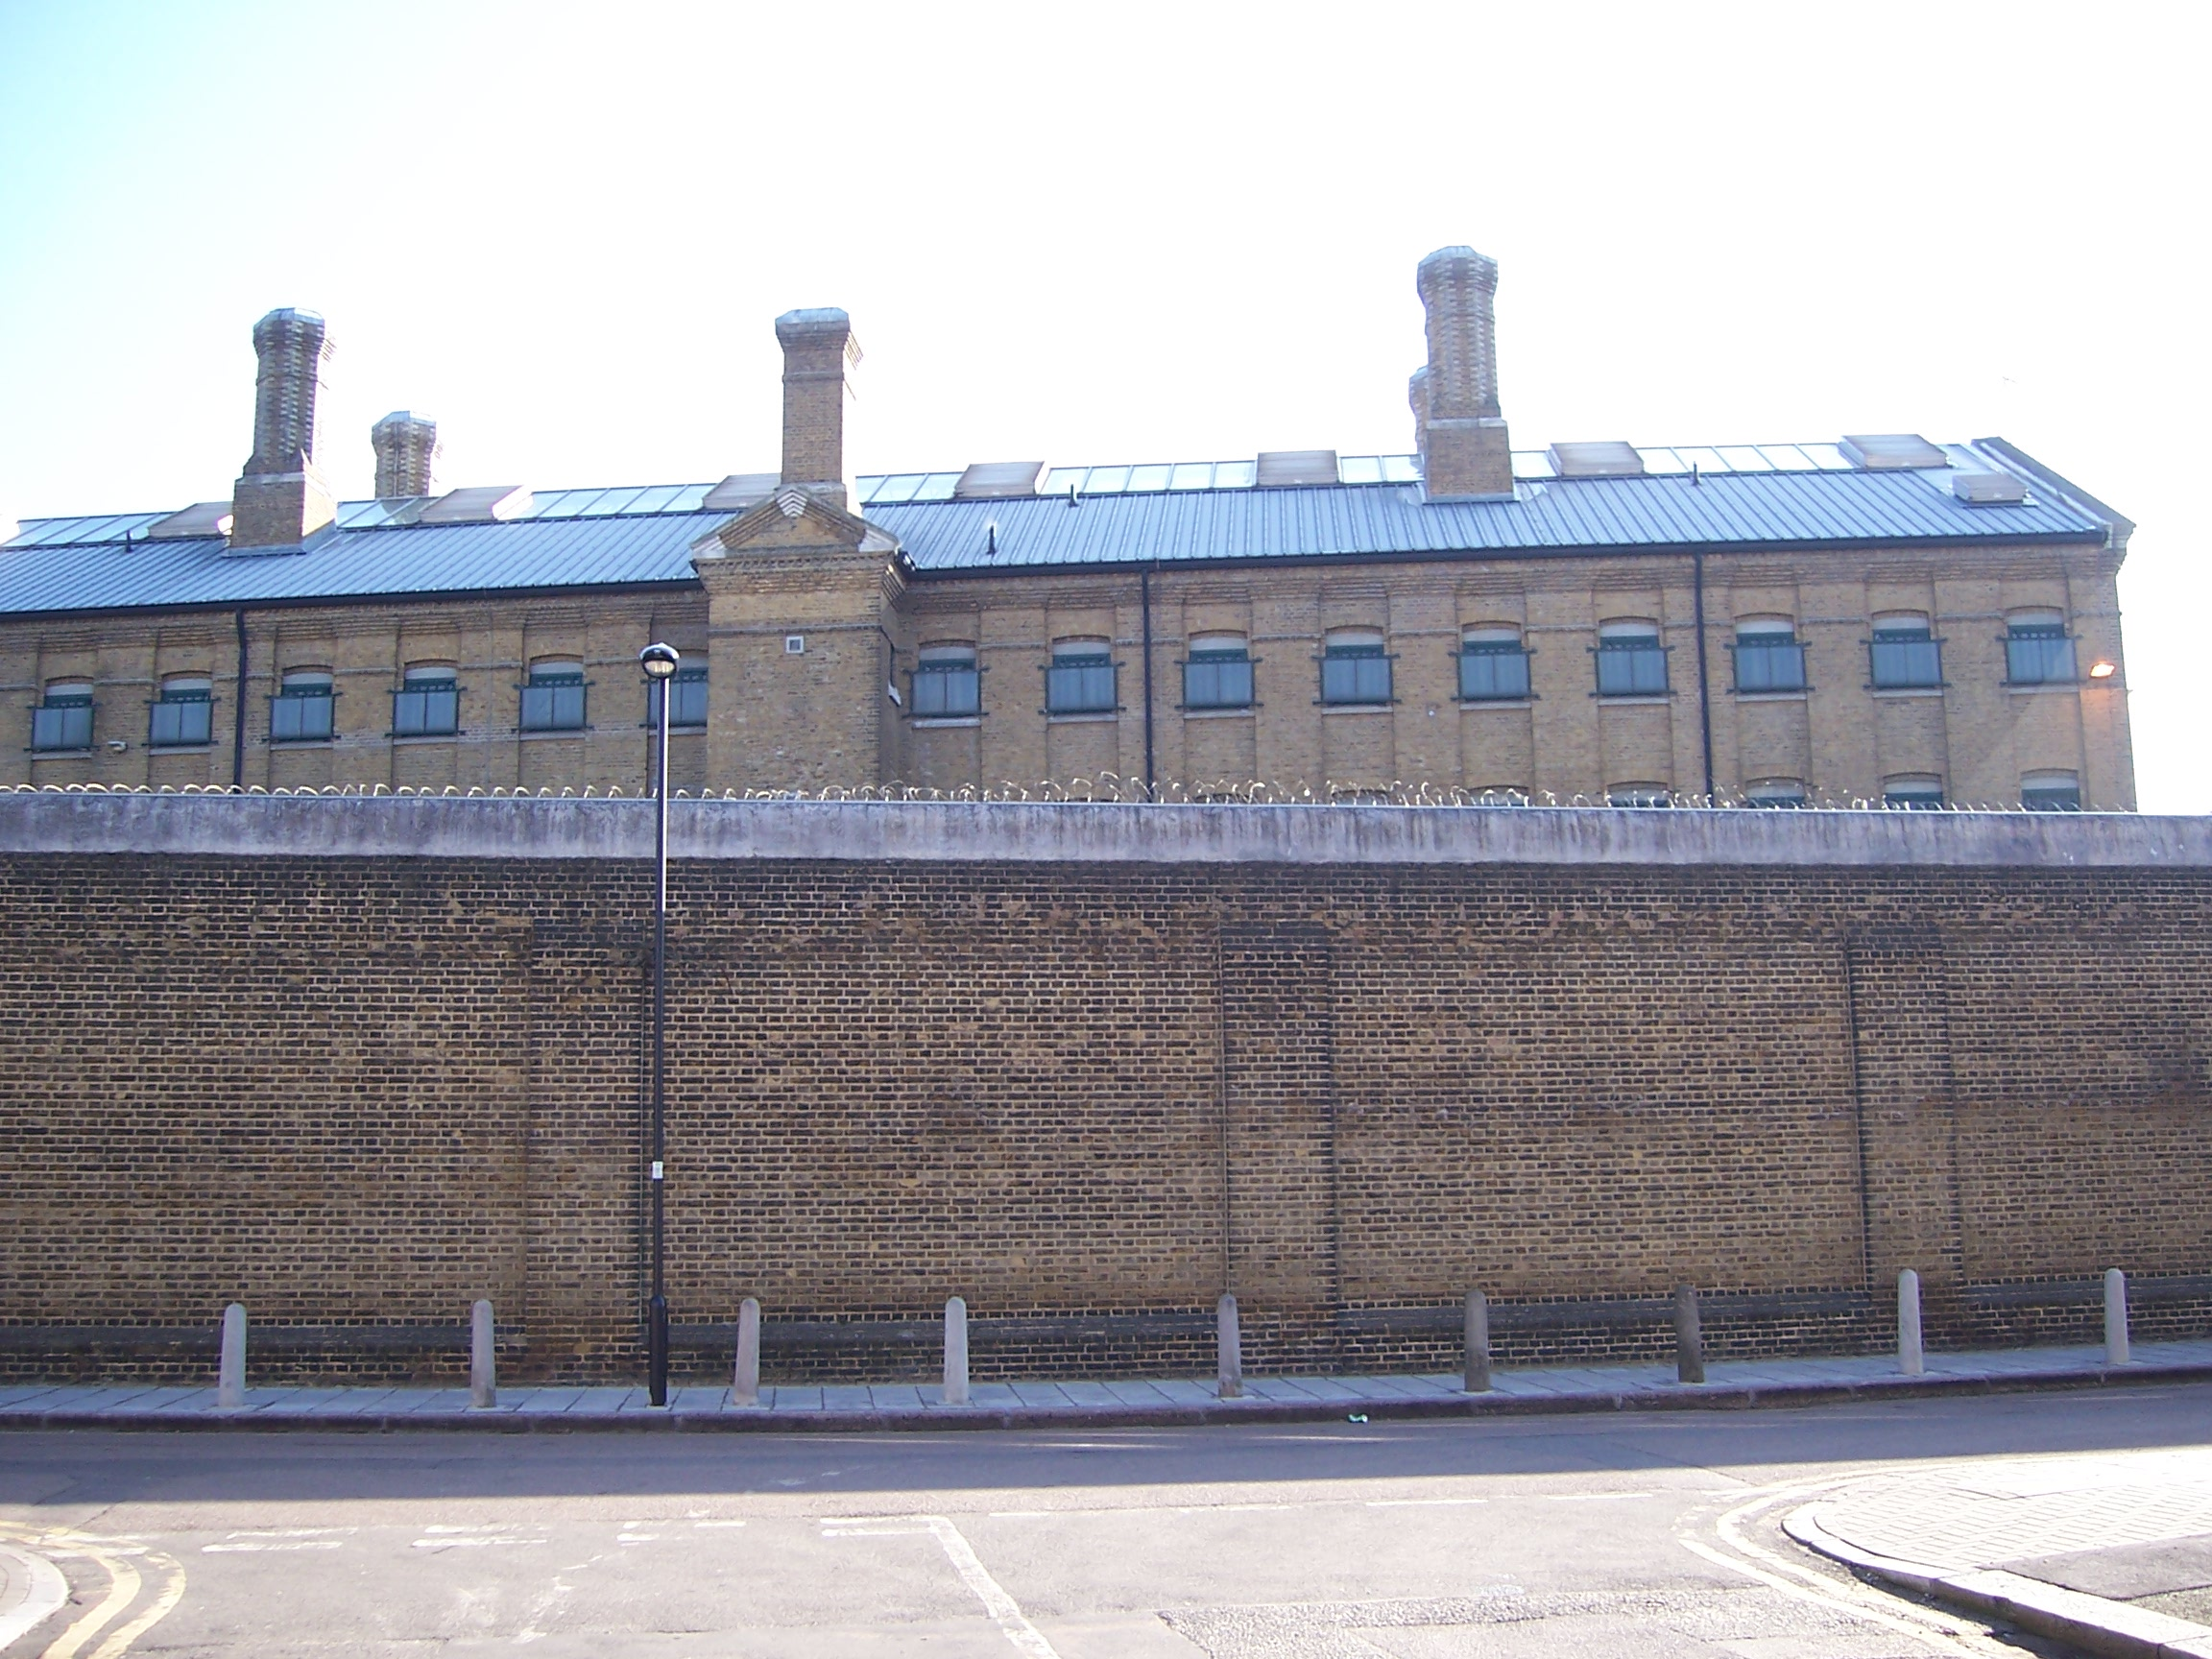 Brixton Prison. Photograph by sarflondondunc